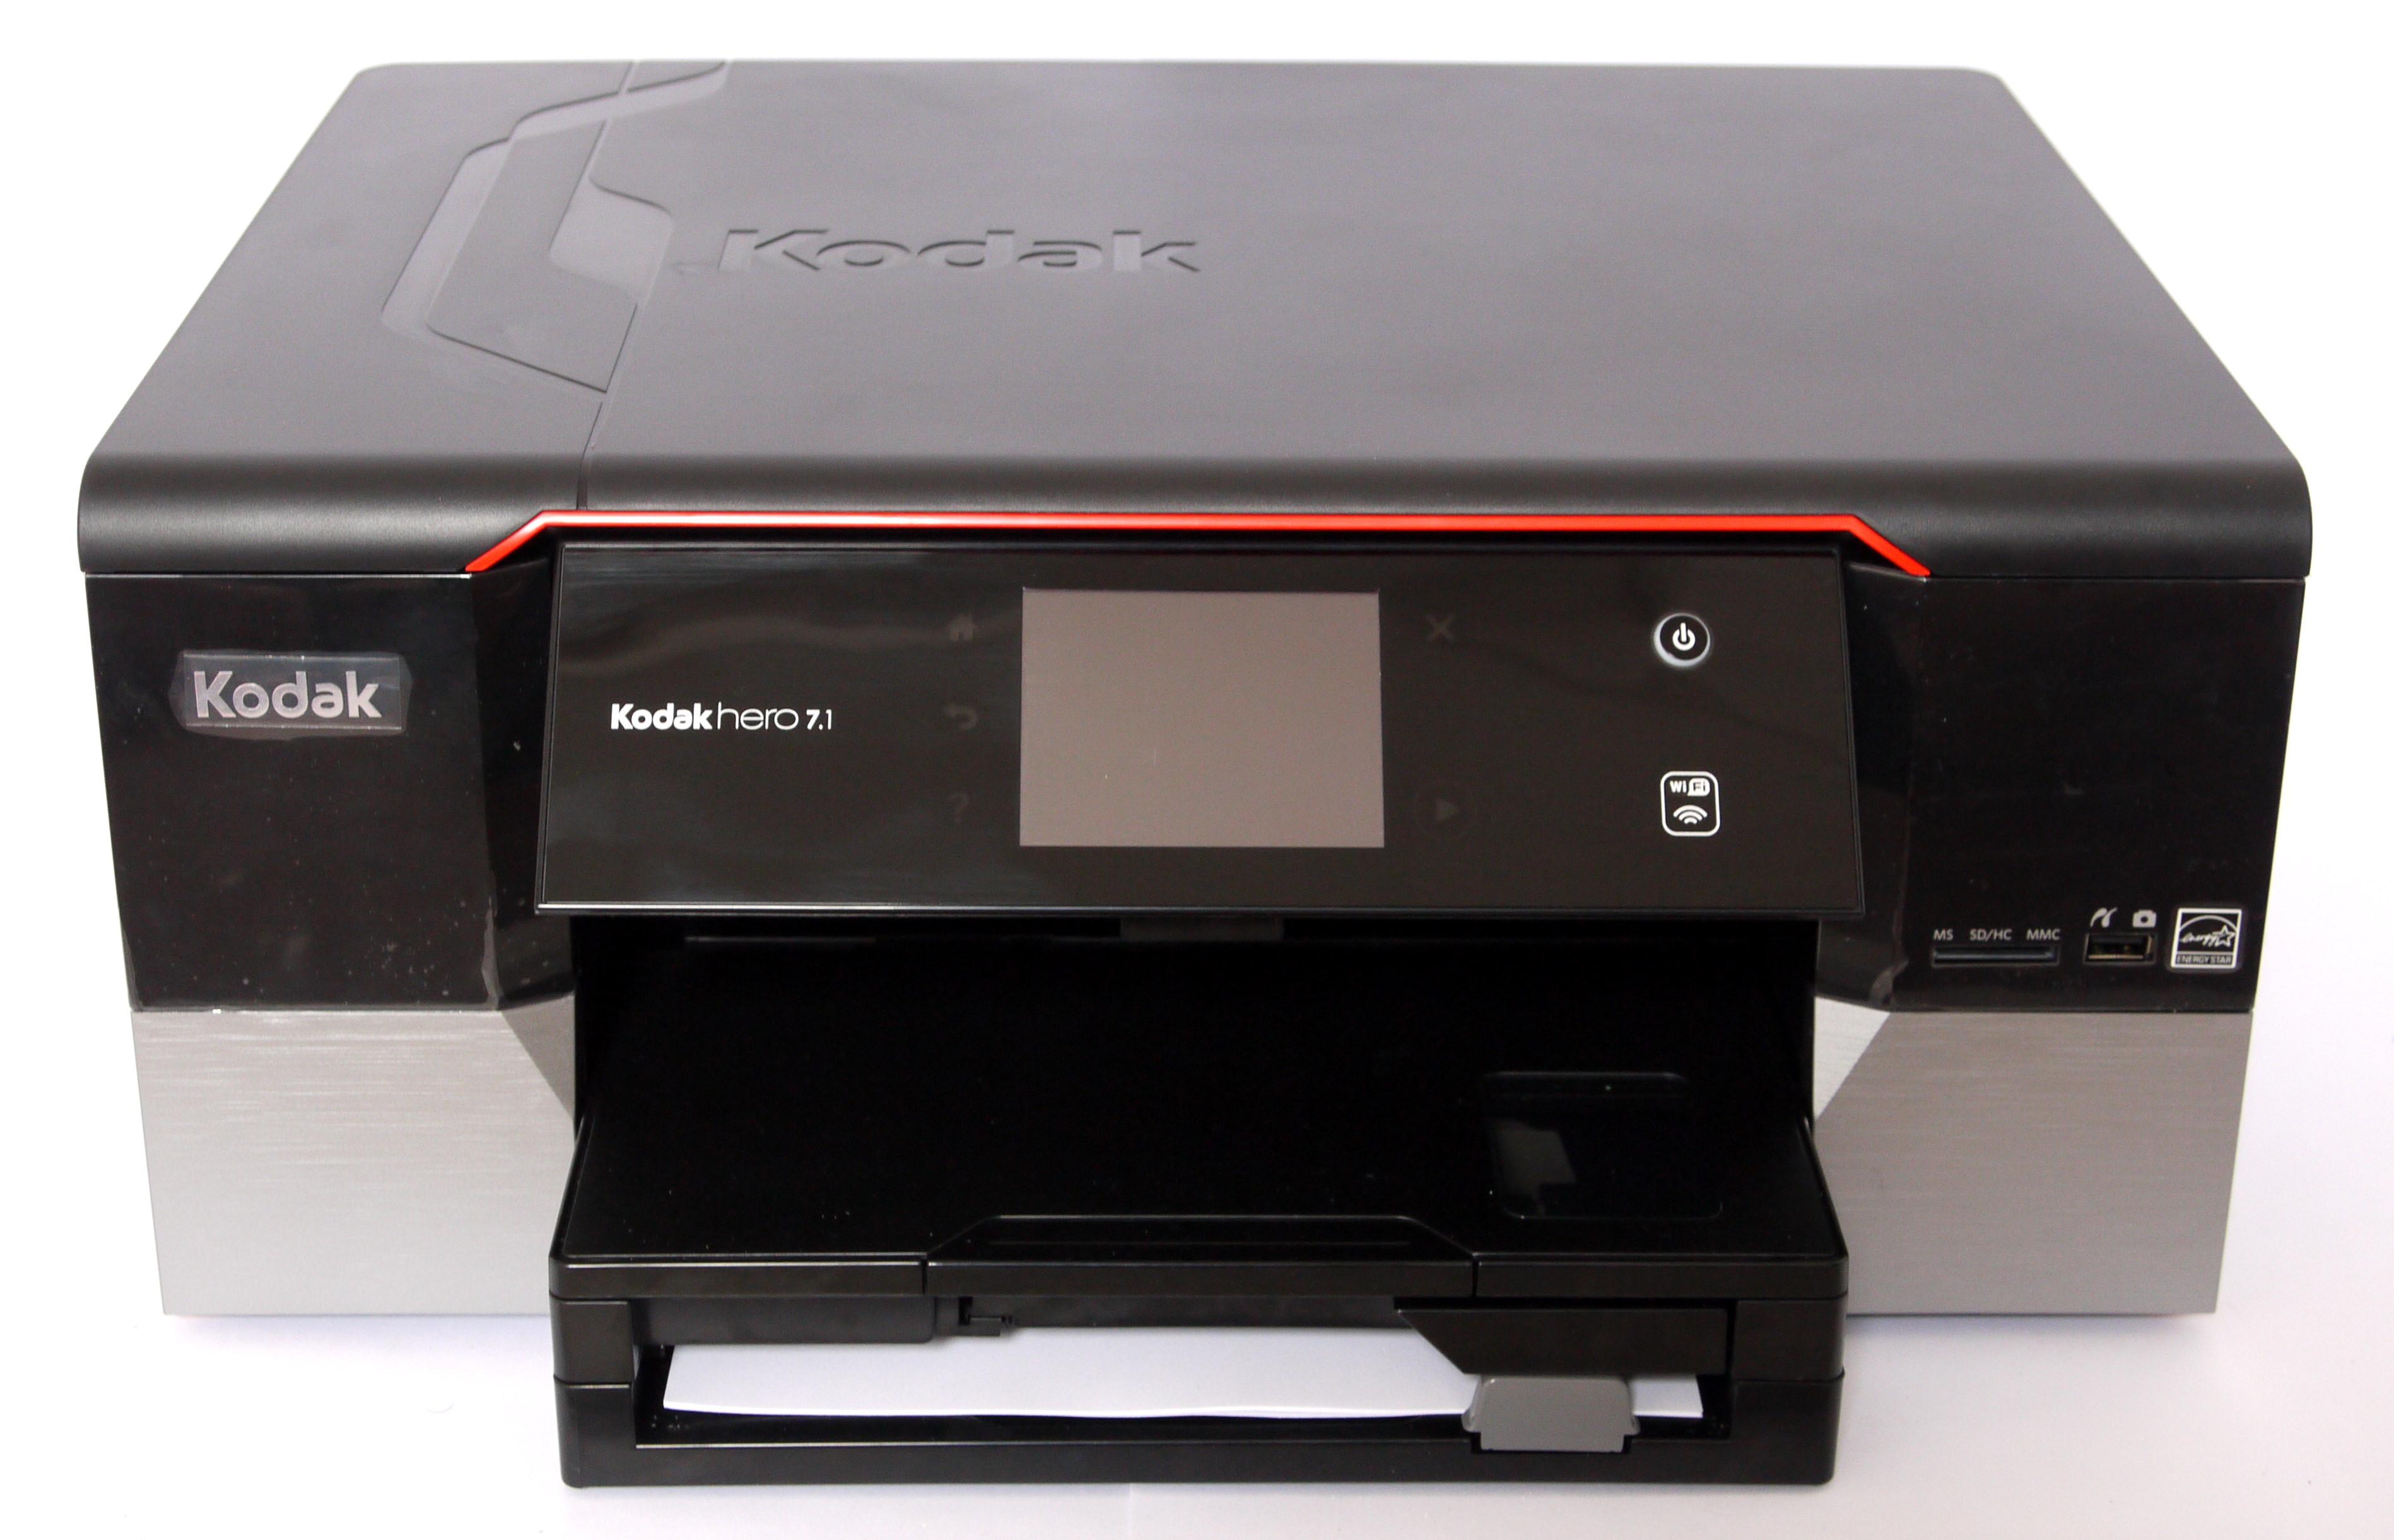 Kodak Hero 7 1 All-In-One Printer Review | ePHOTOzine